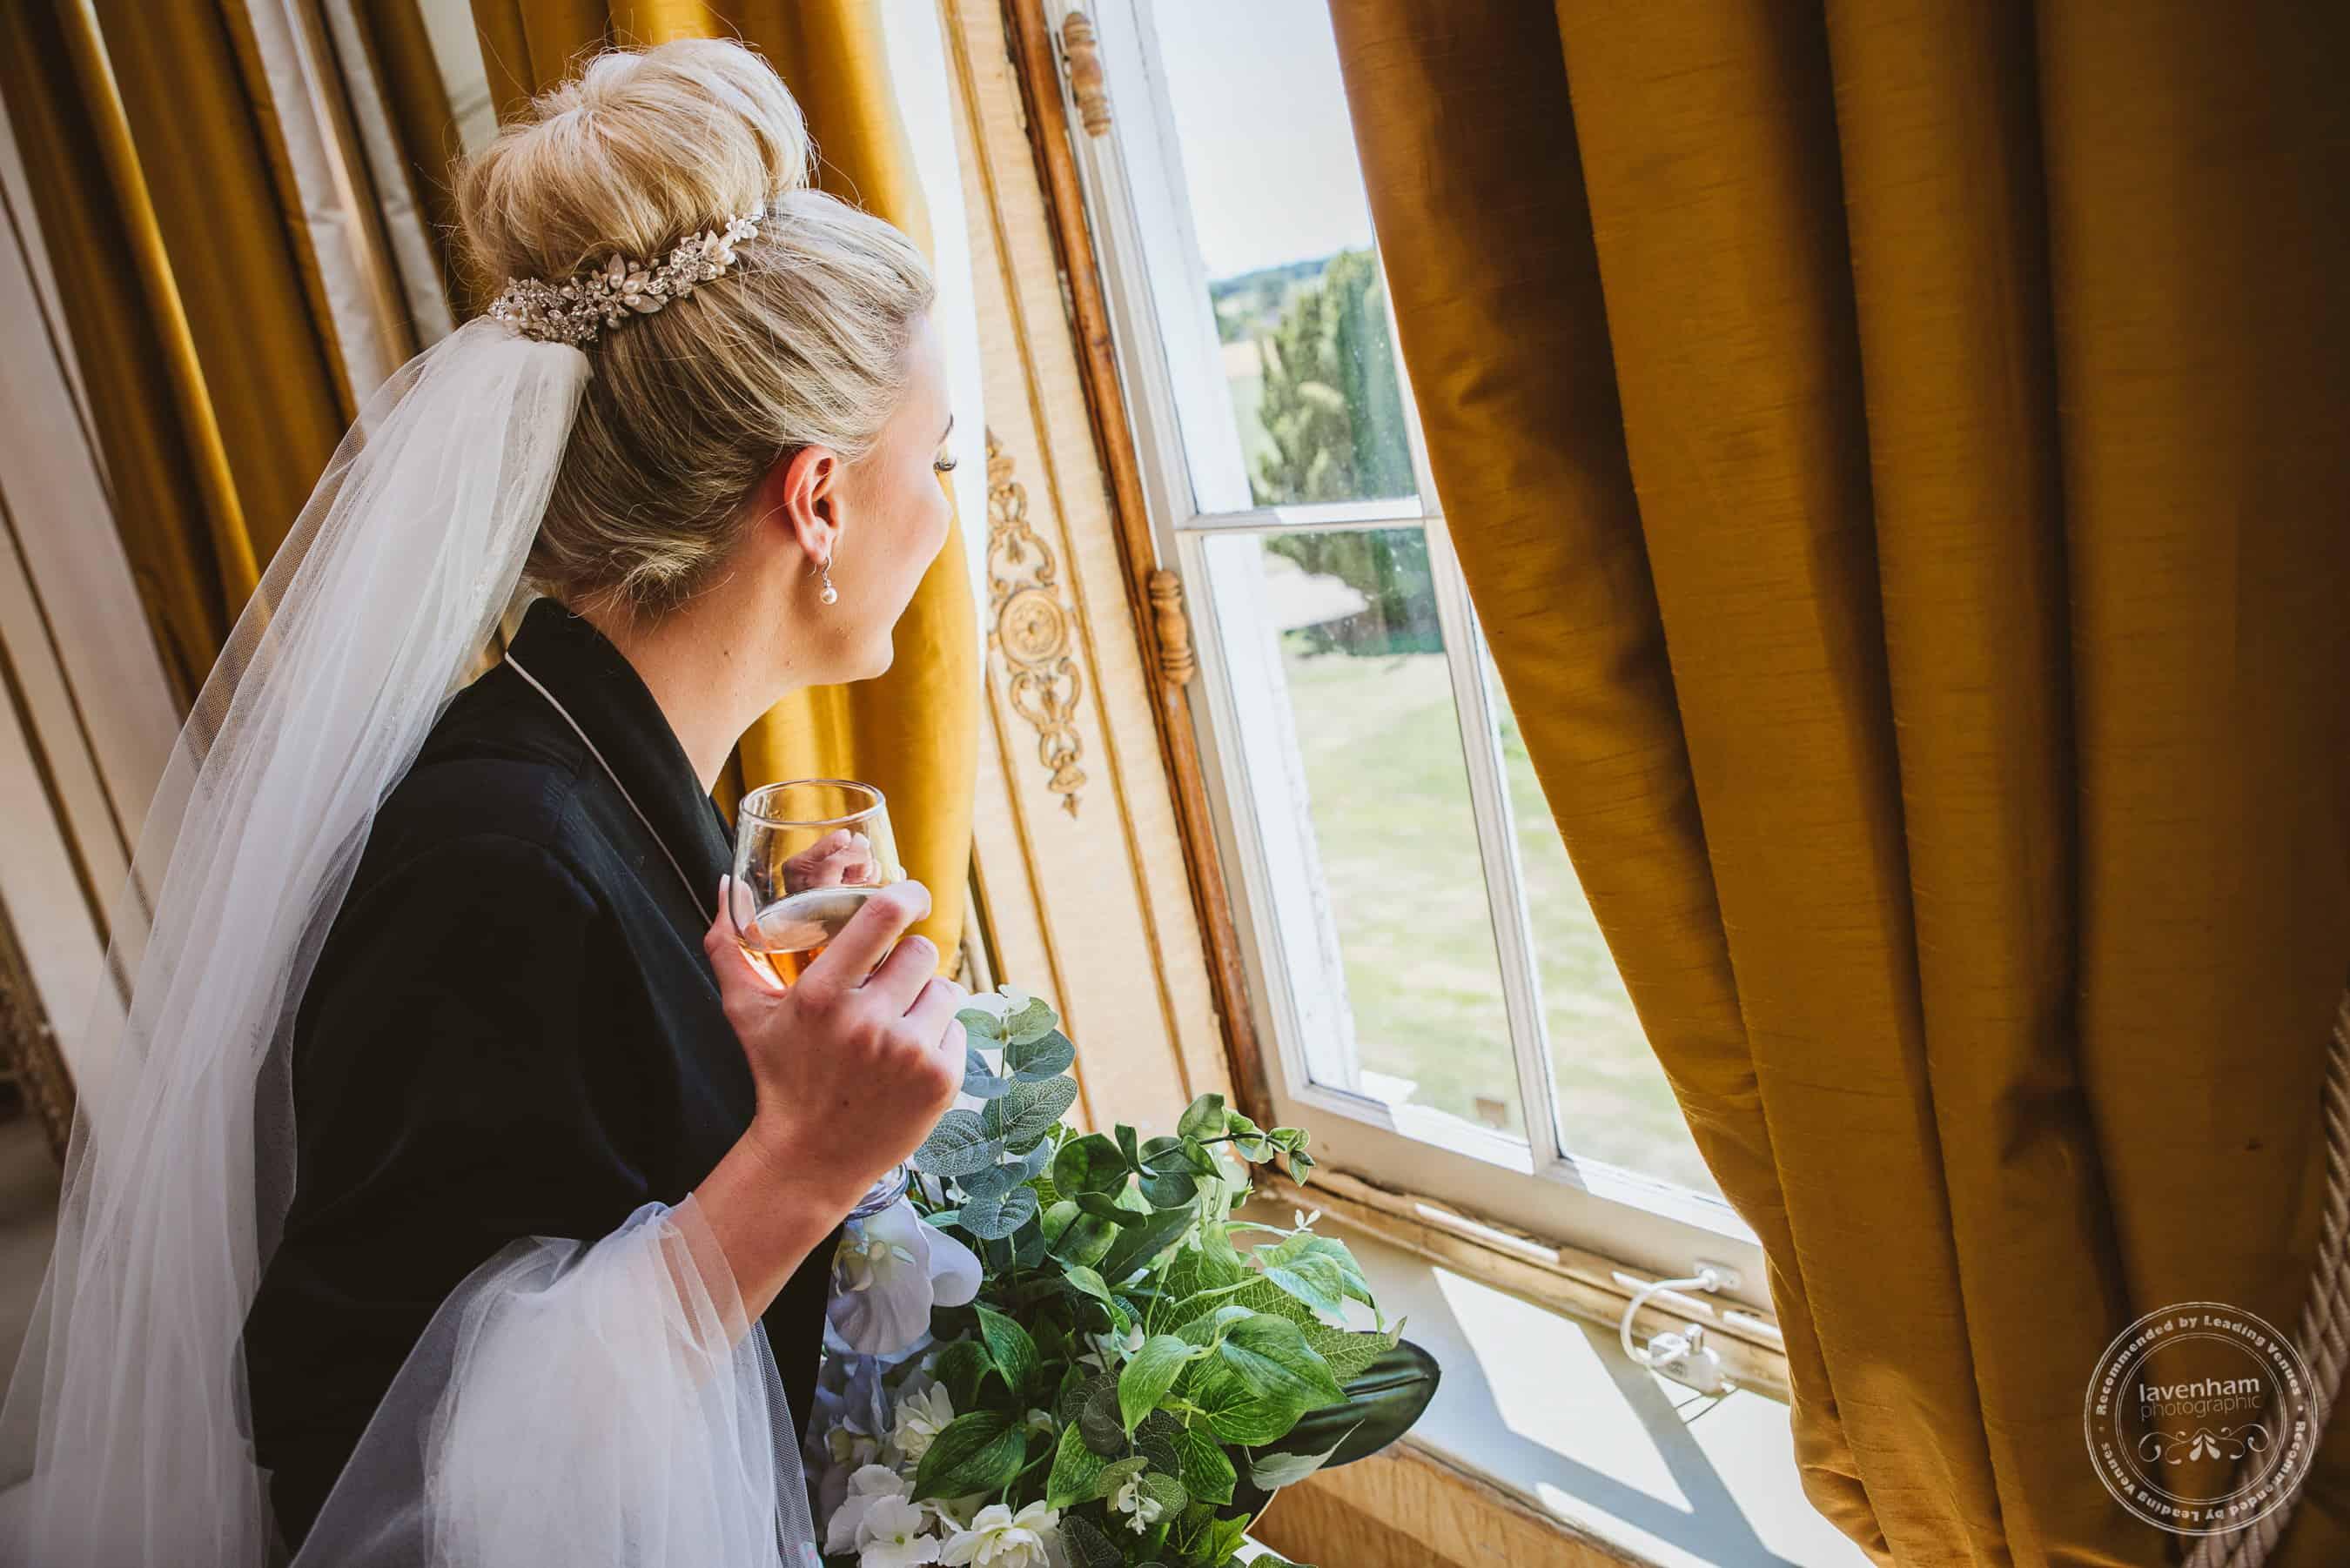 220618 Gosfield Hall Wedding Photography Lavenham Photographic 0015